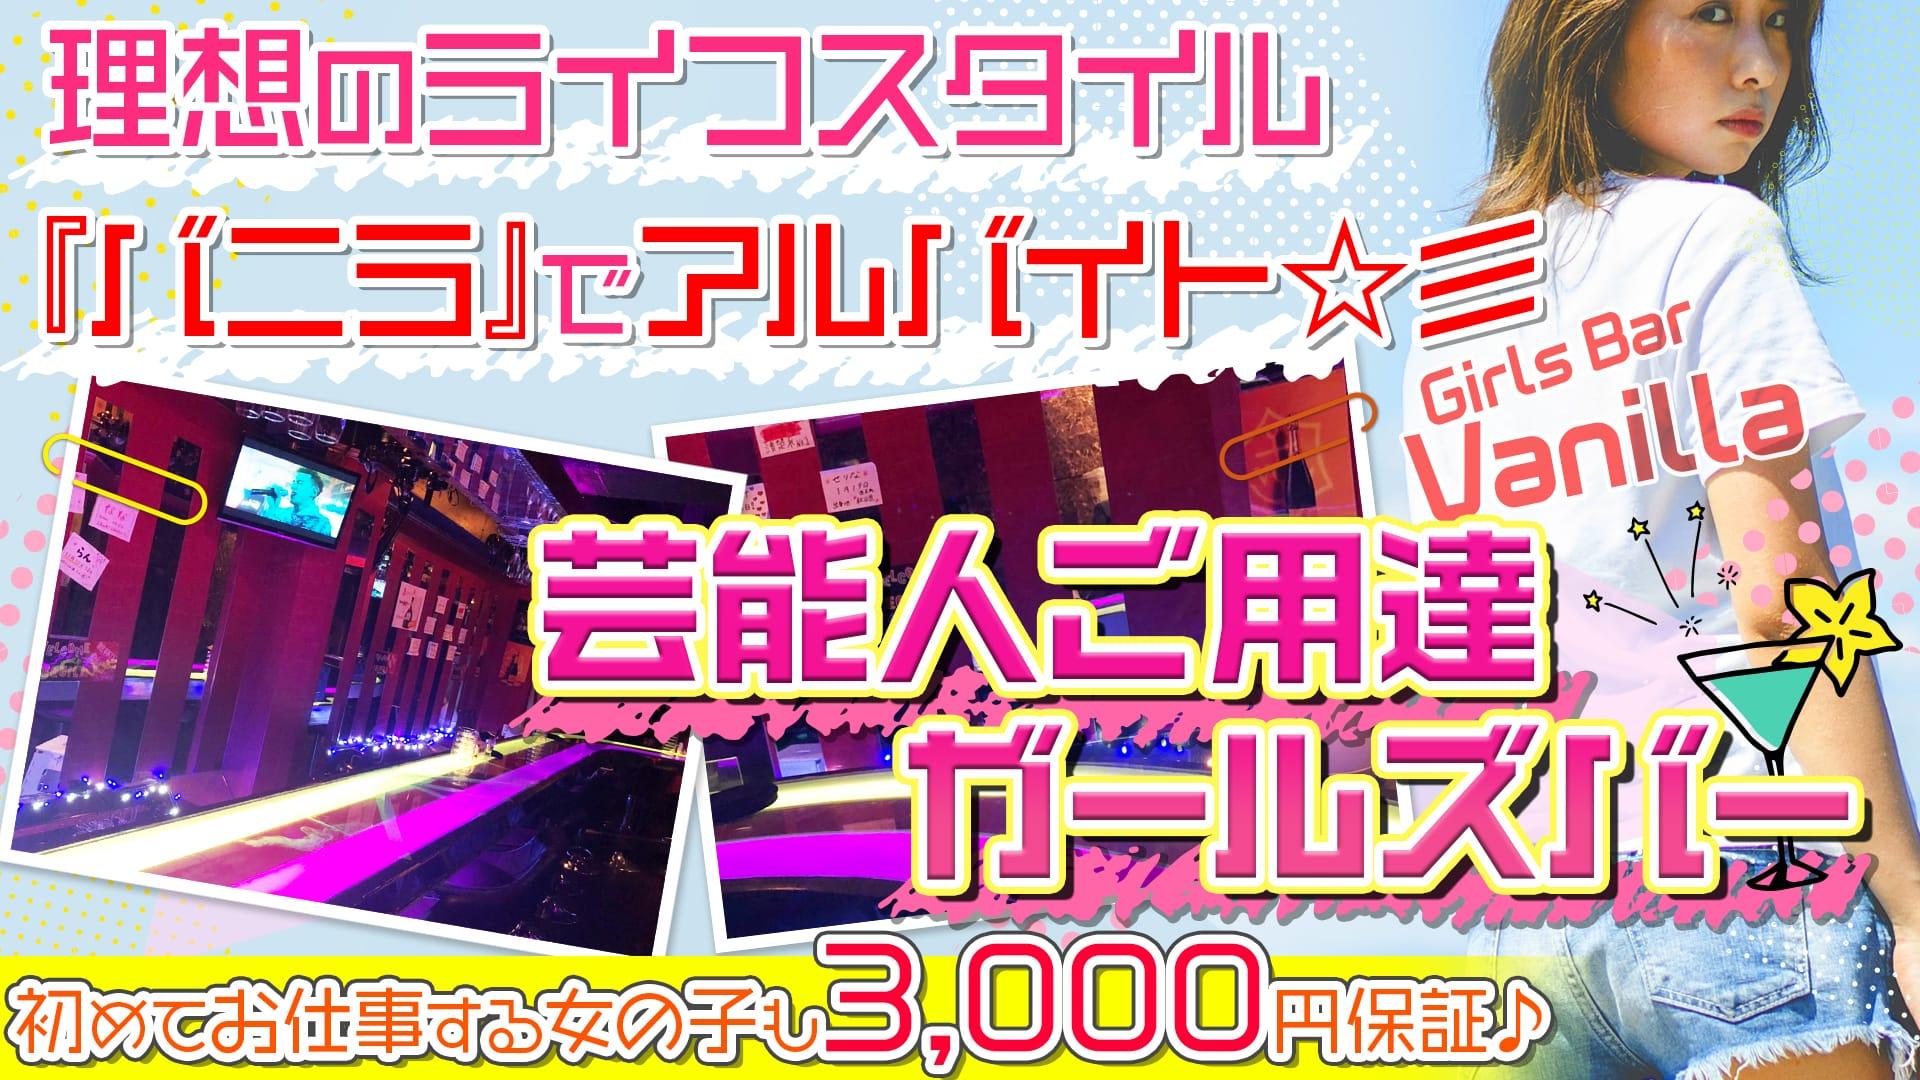 Girls Bar  Vanilla~バニラ~ 目黒ガールズバー TOP画像